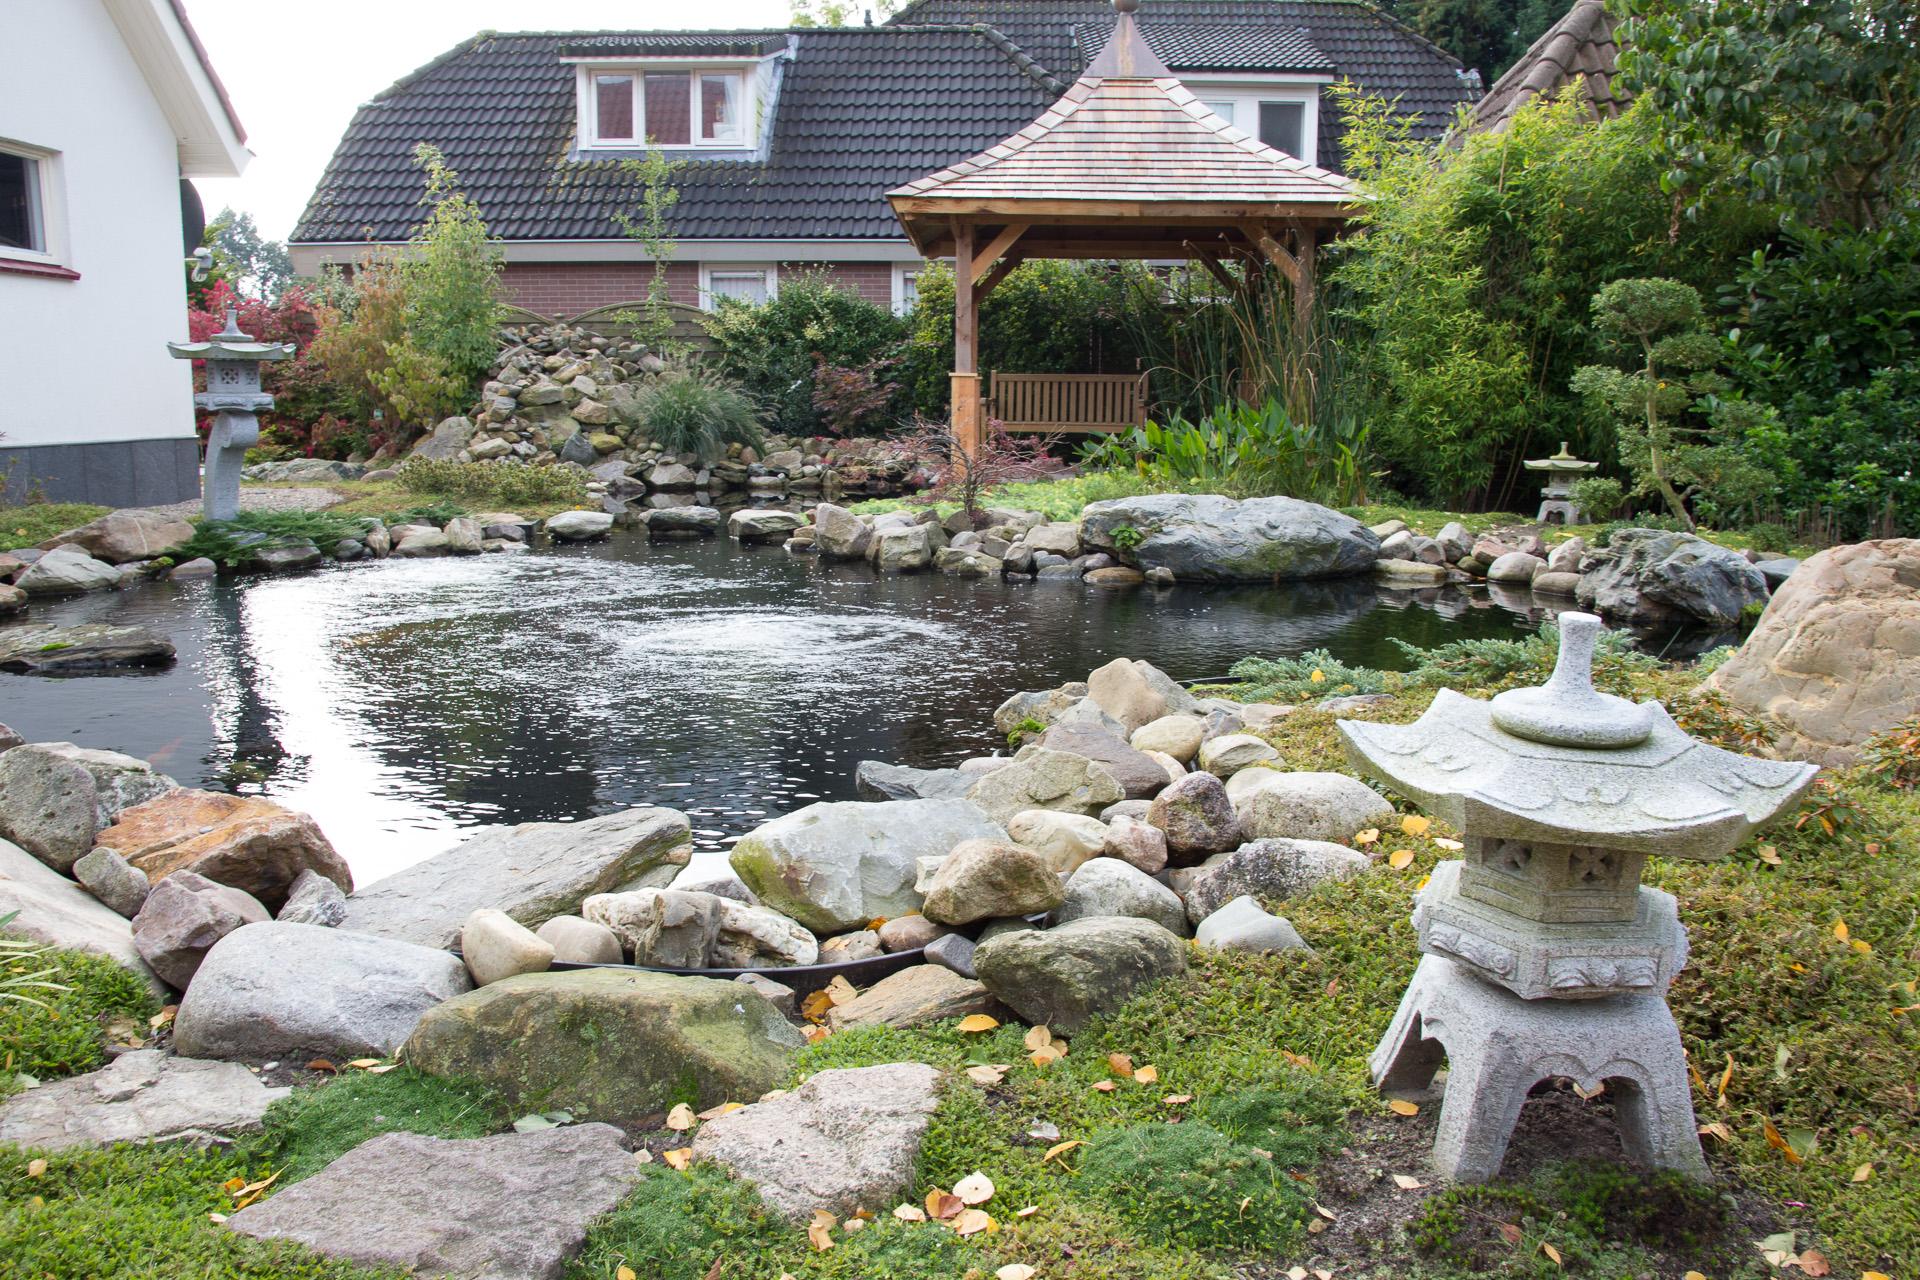 Japanse tuin nijverdal tuincentrum bloemsierkunst for Vacature tuin